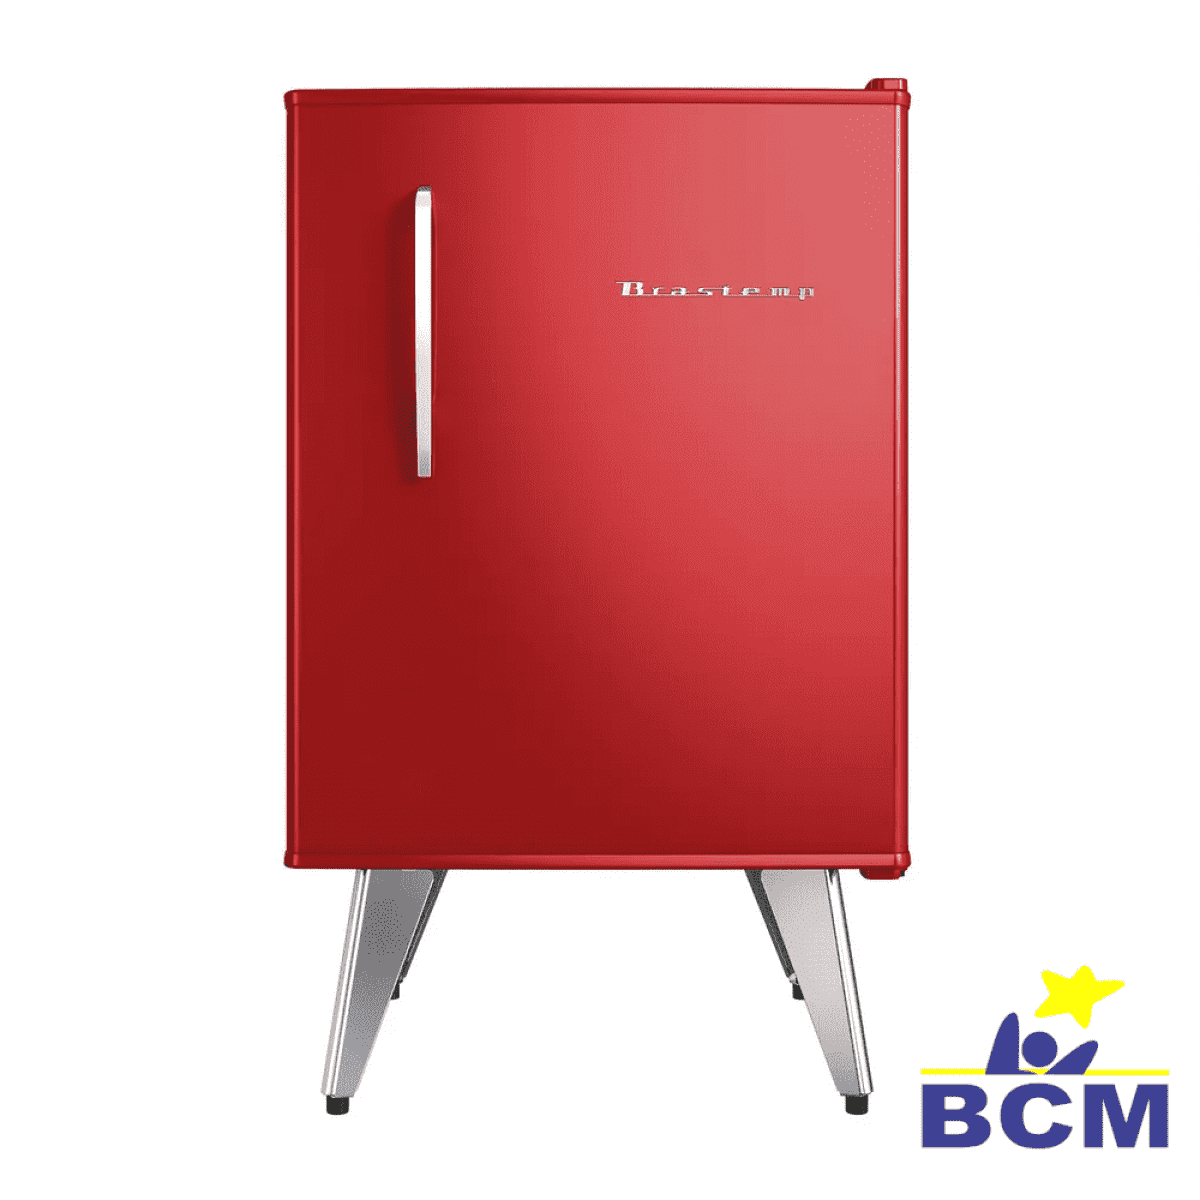 Frigobar Brastemp Retro 76L Vermelho - 110V